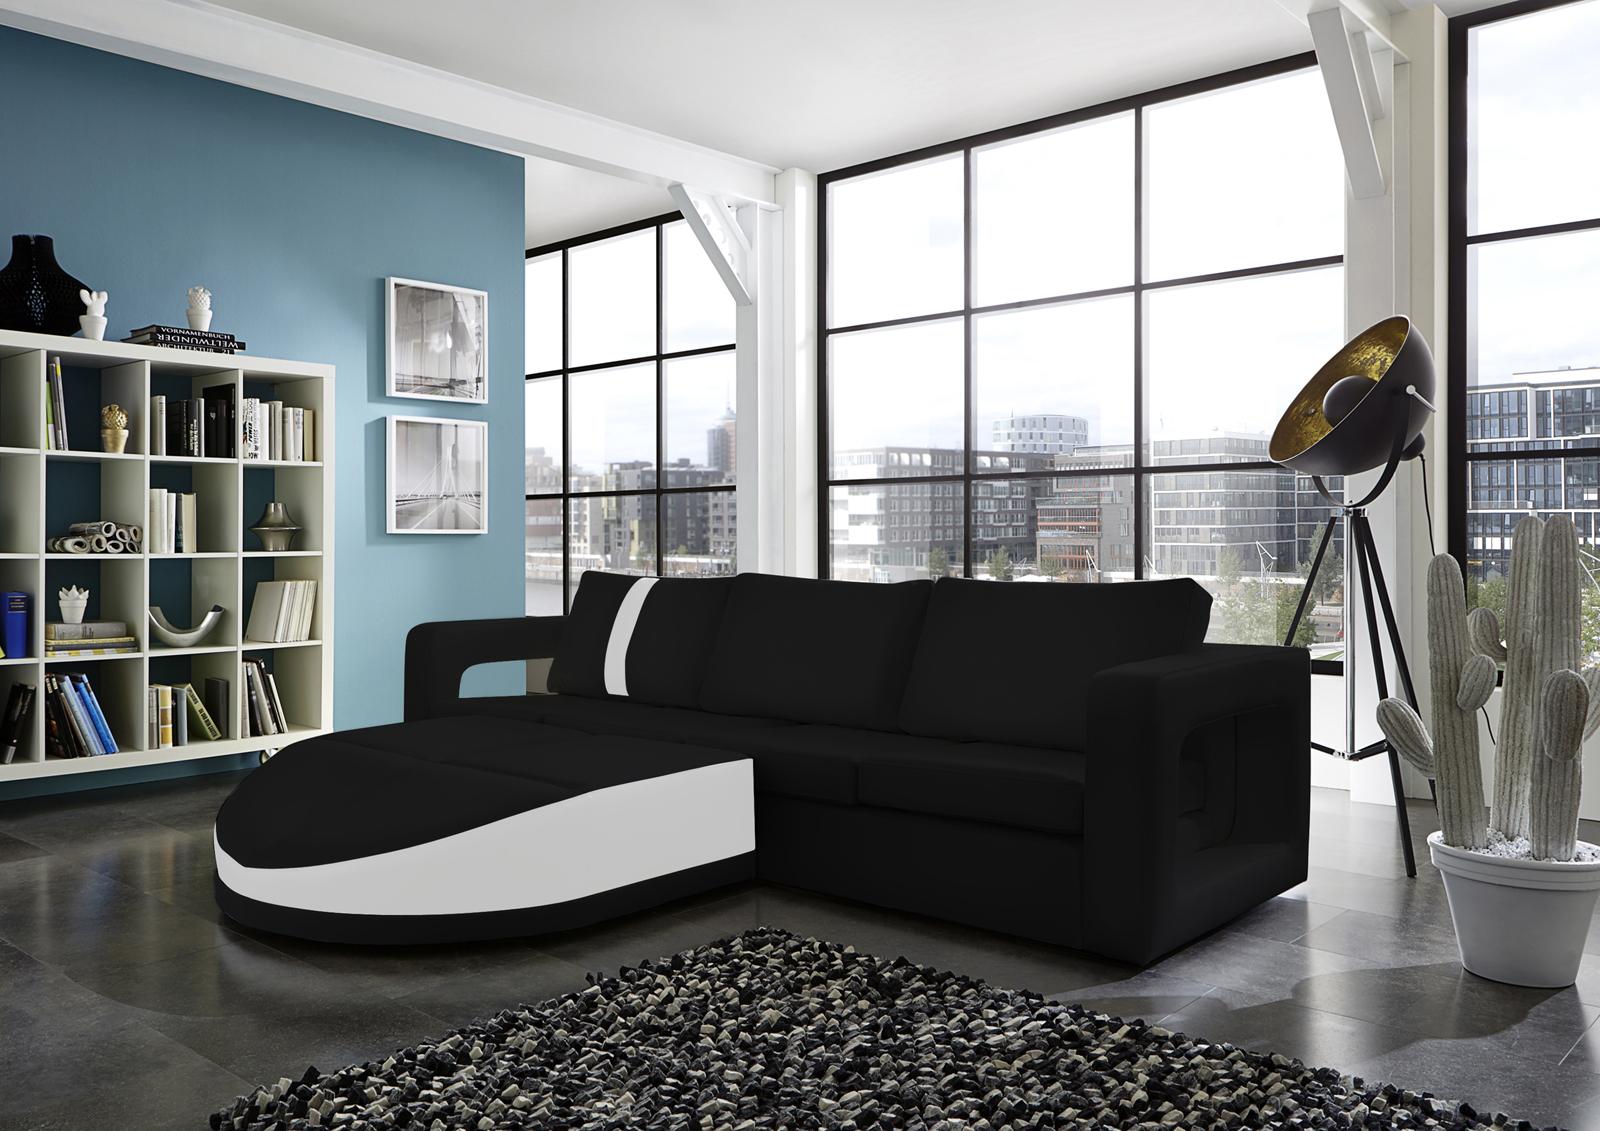 sam ecksofa schwarz wei sofa doccia 200 x 274 cm auf lager. Black Bedroom Furniture Sets. Home Design Ideas